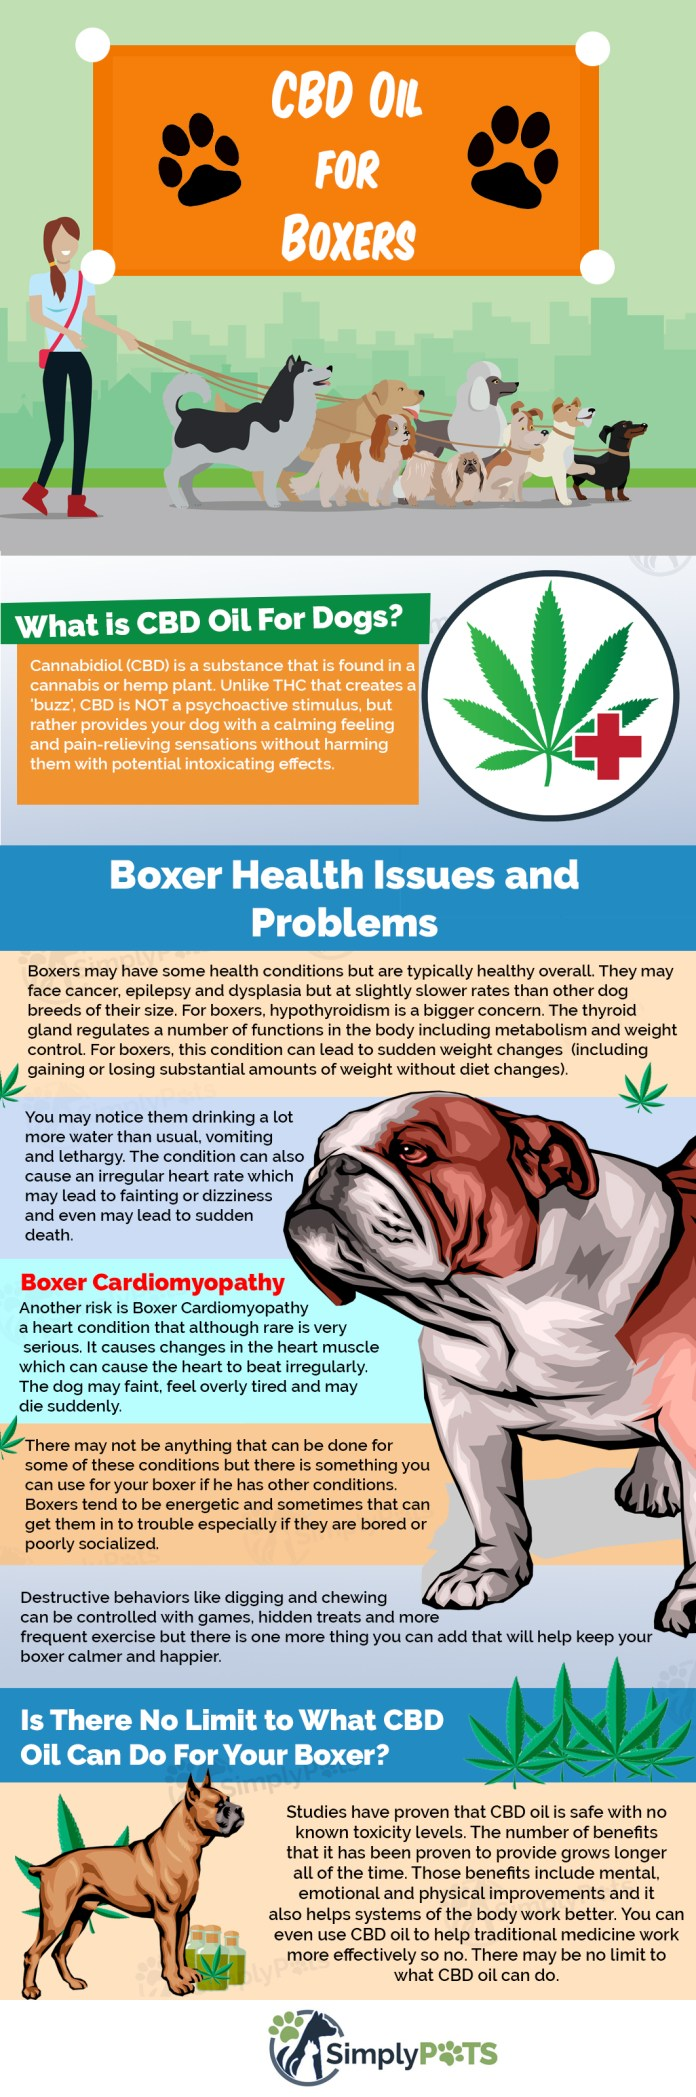 CBD Oil for [BOXERS] How Cannabis Hemp Tincture Can Help